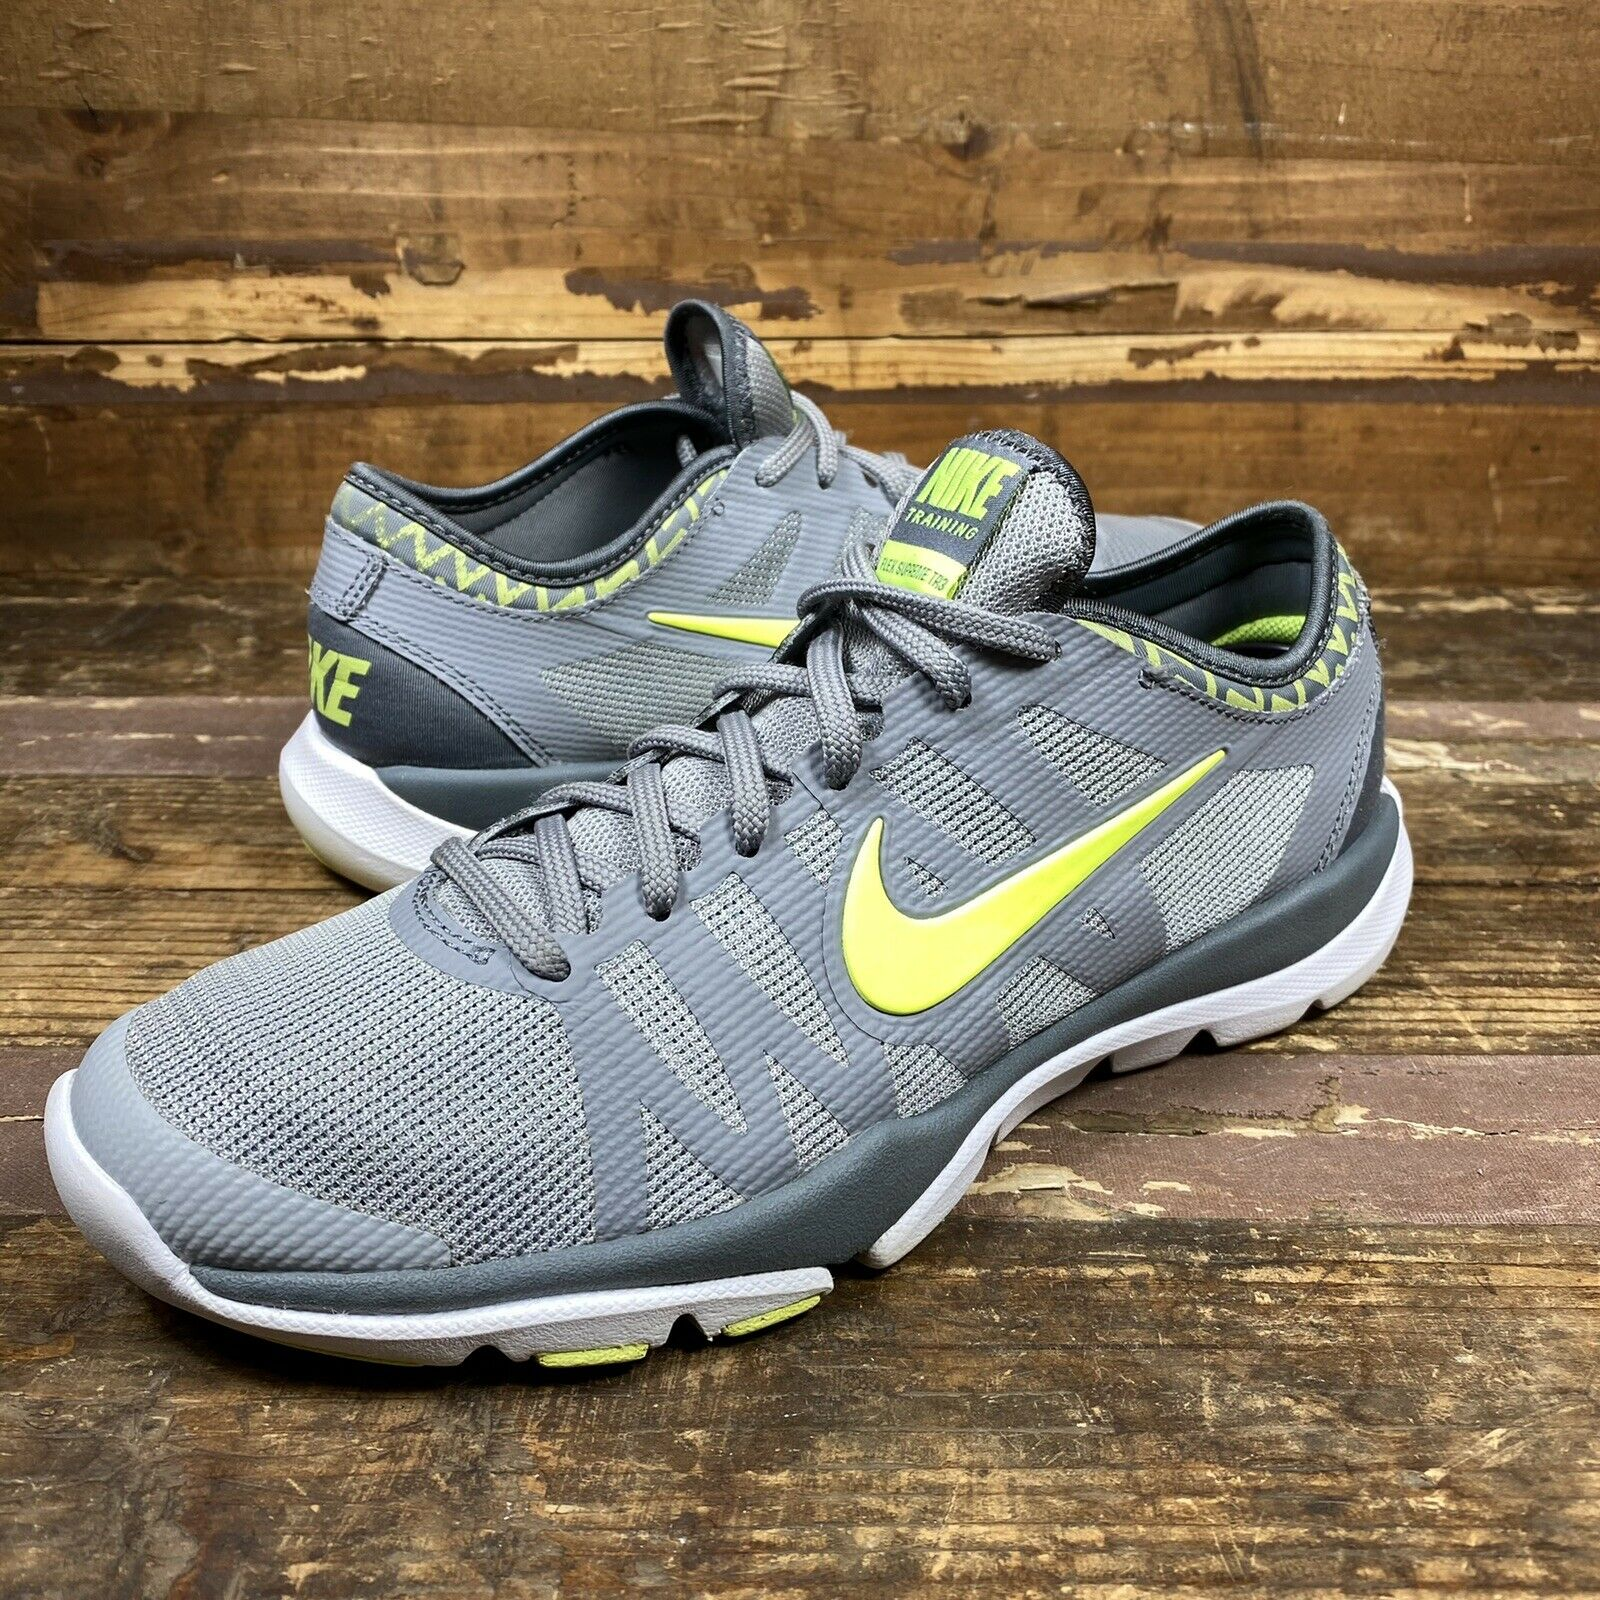 Pareja Oscurecer Apuesta  Nike Womens Flex Supreme TR 3 Grey Athletic Shoes. Size 8.5 Style 683138  005 for sale online   eBay